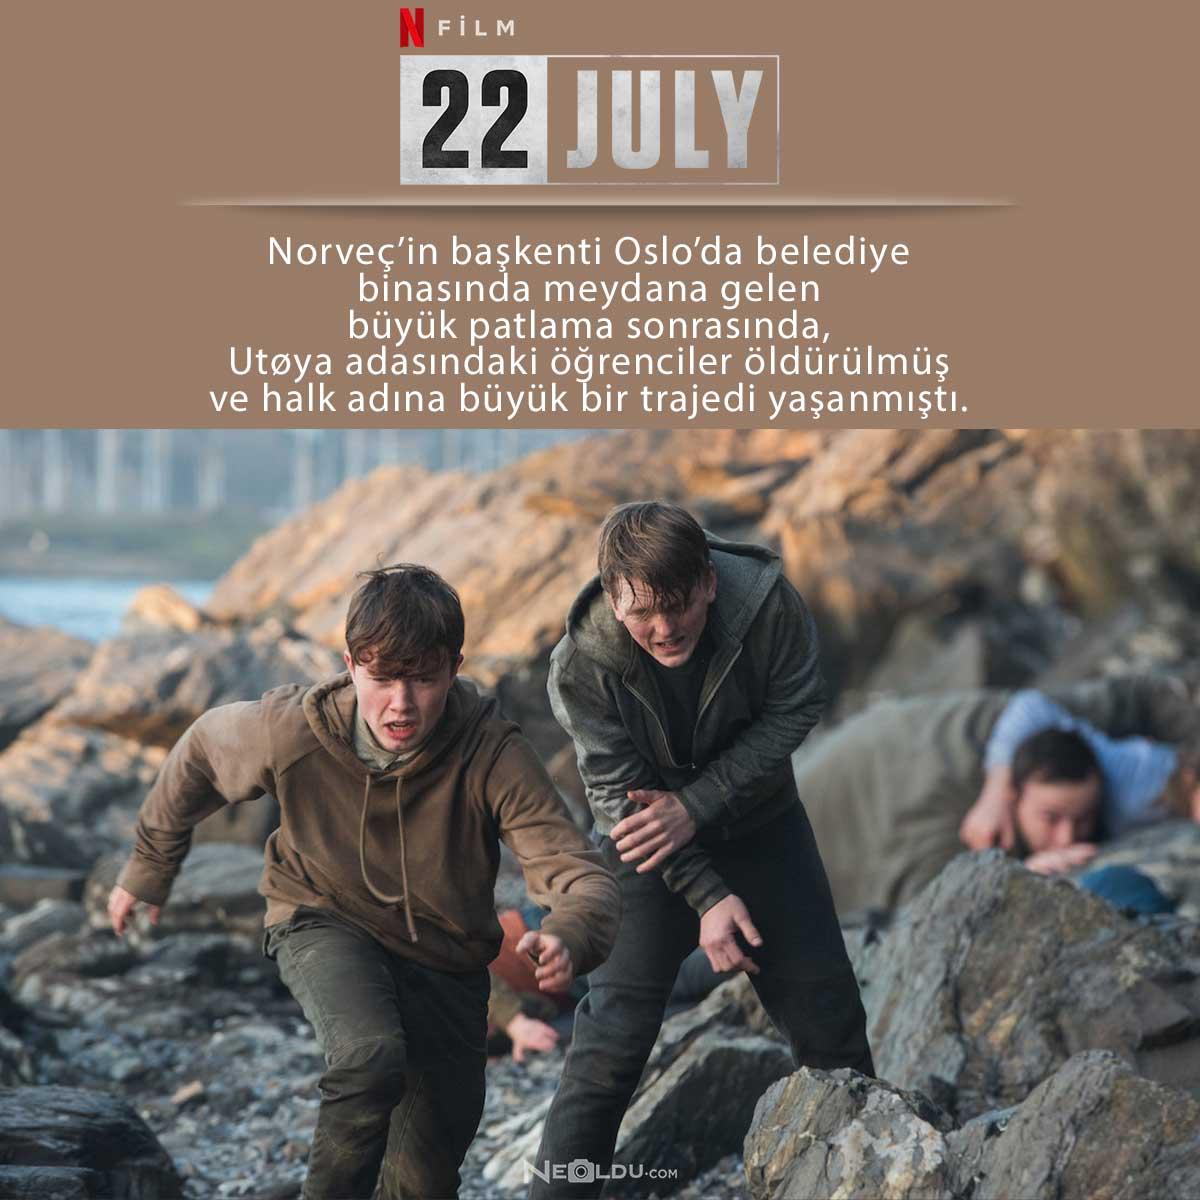 22-july-film.jpg